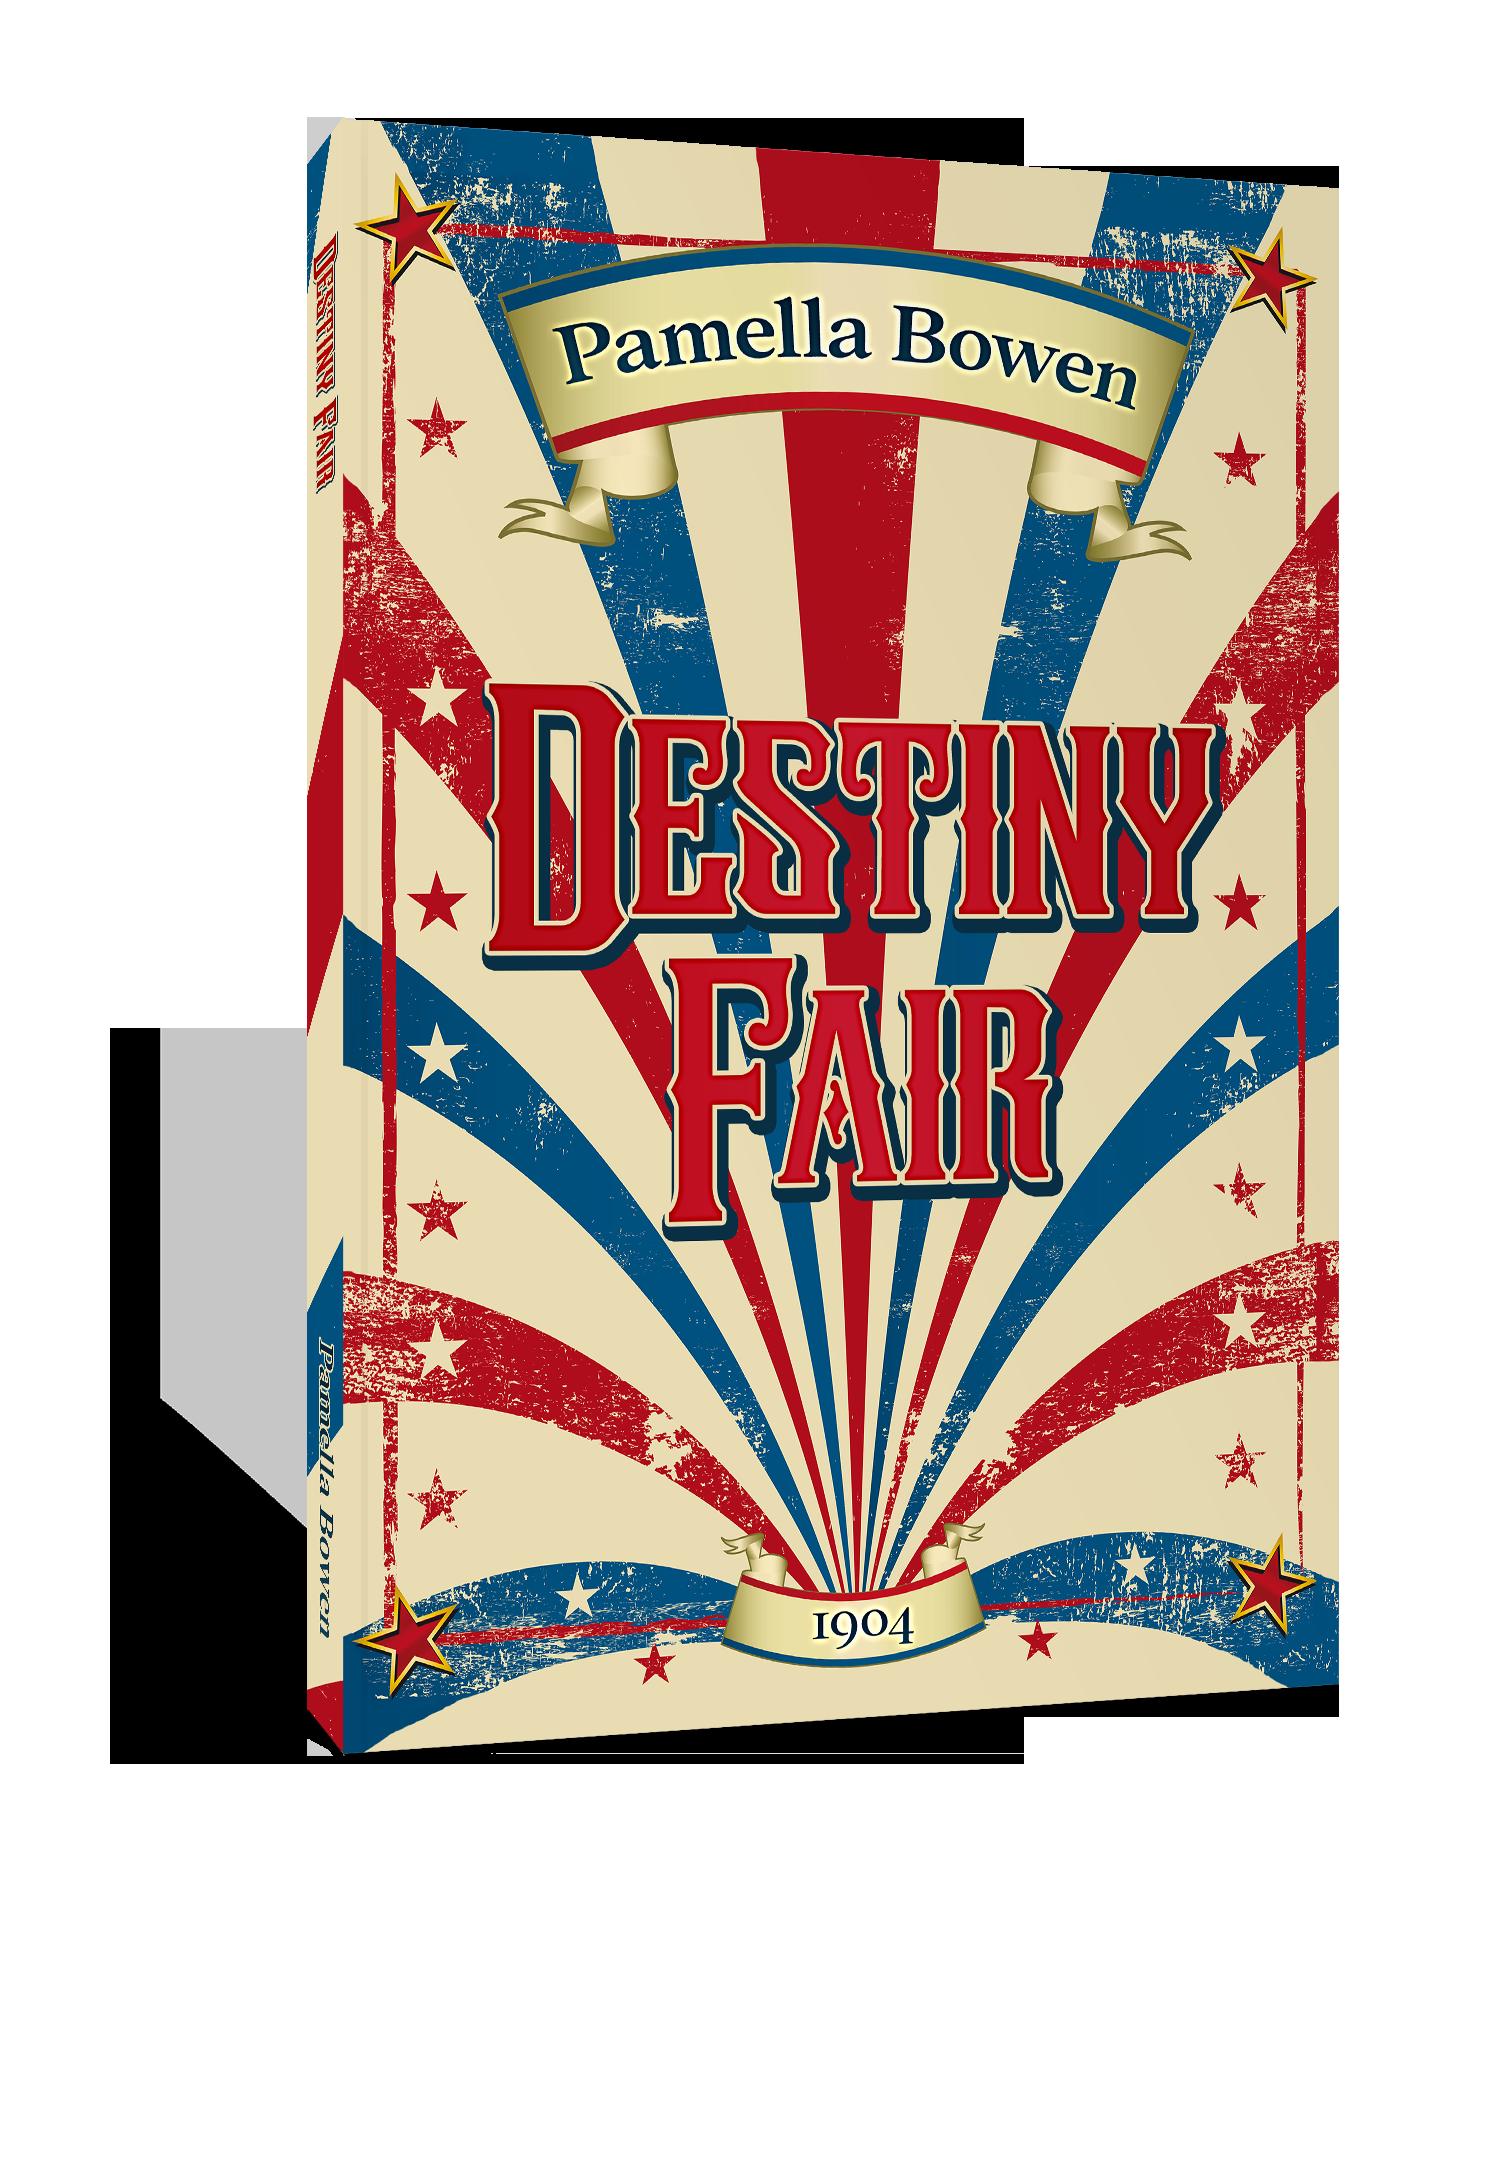 destinyfair 3D cover